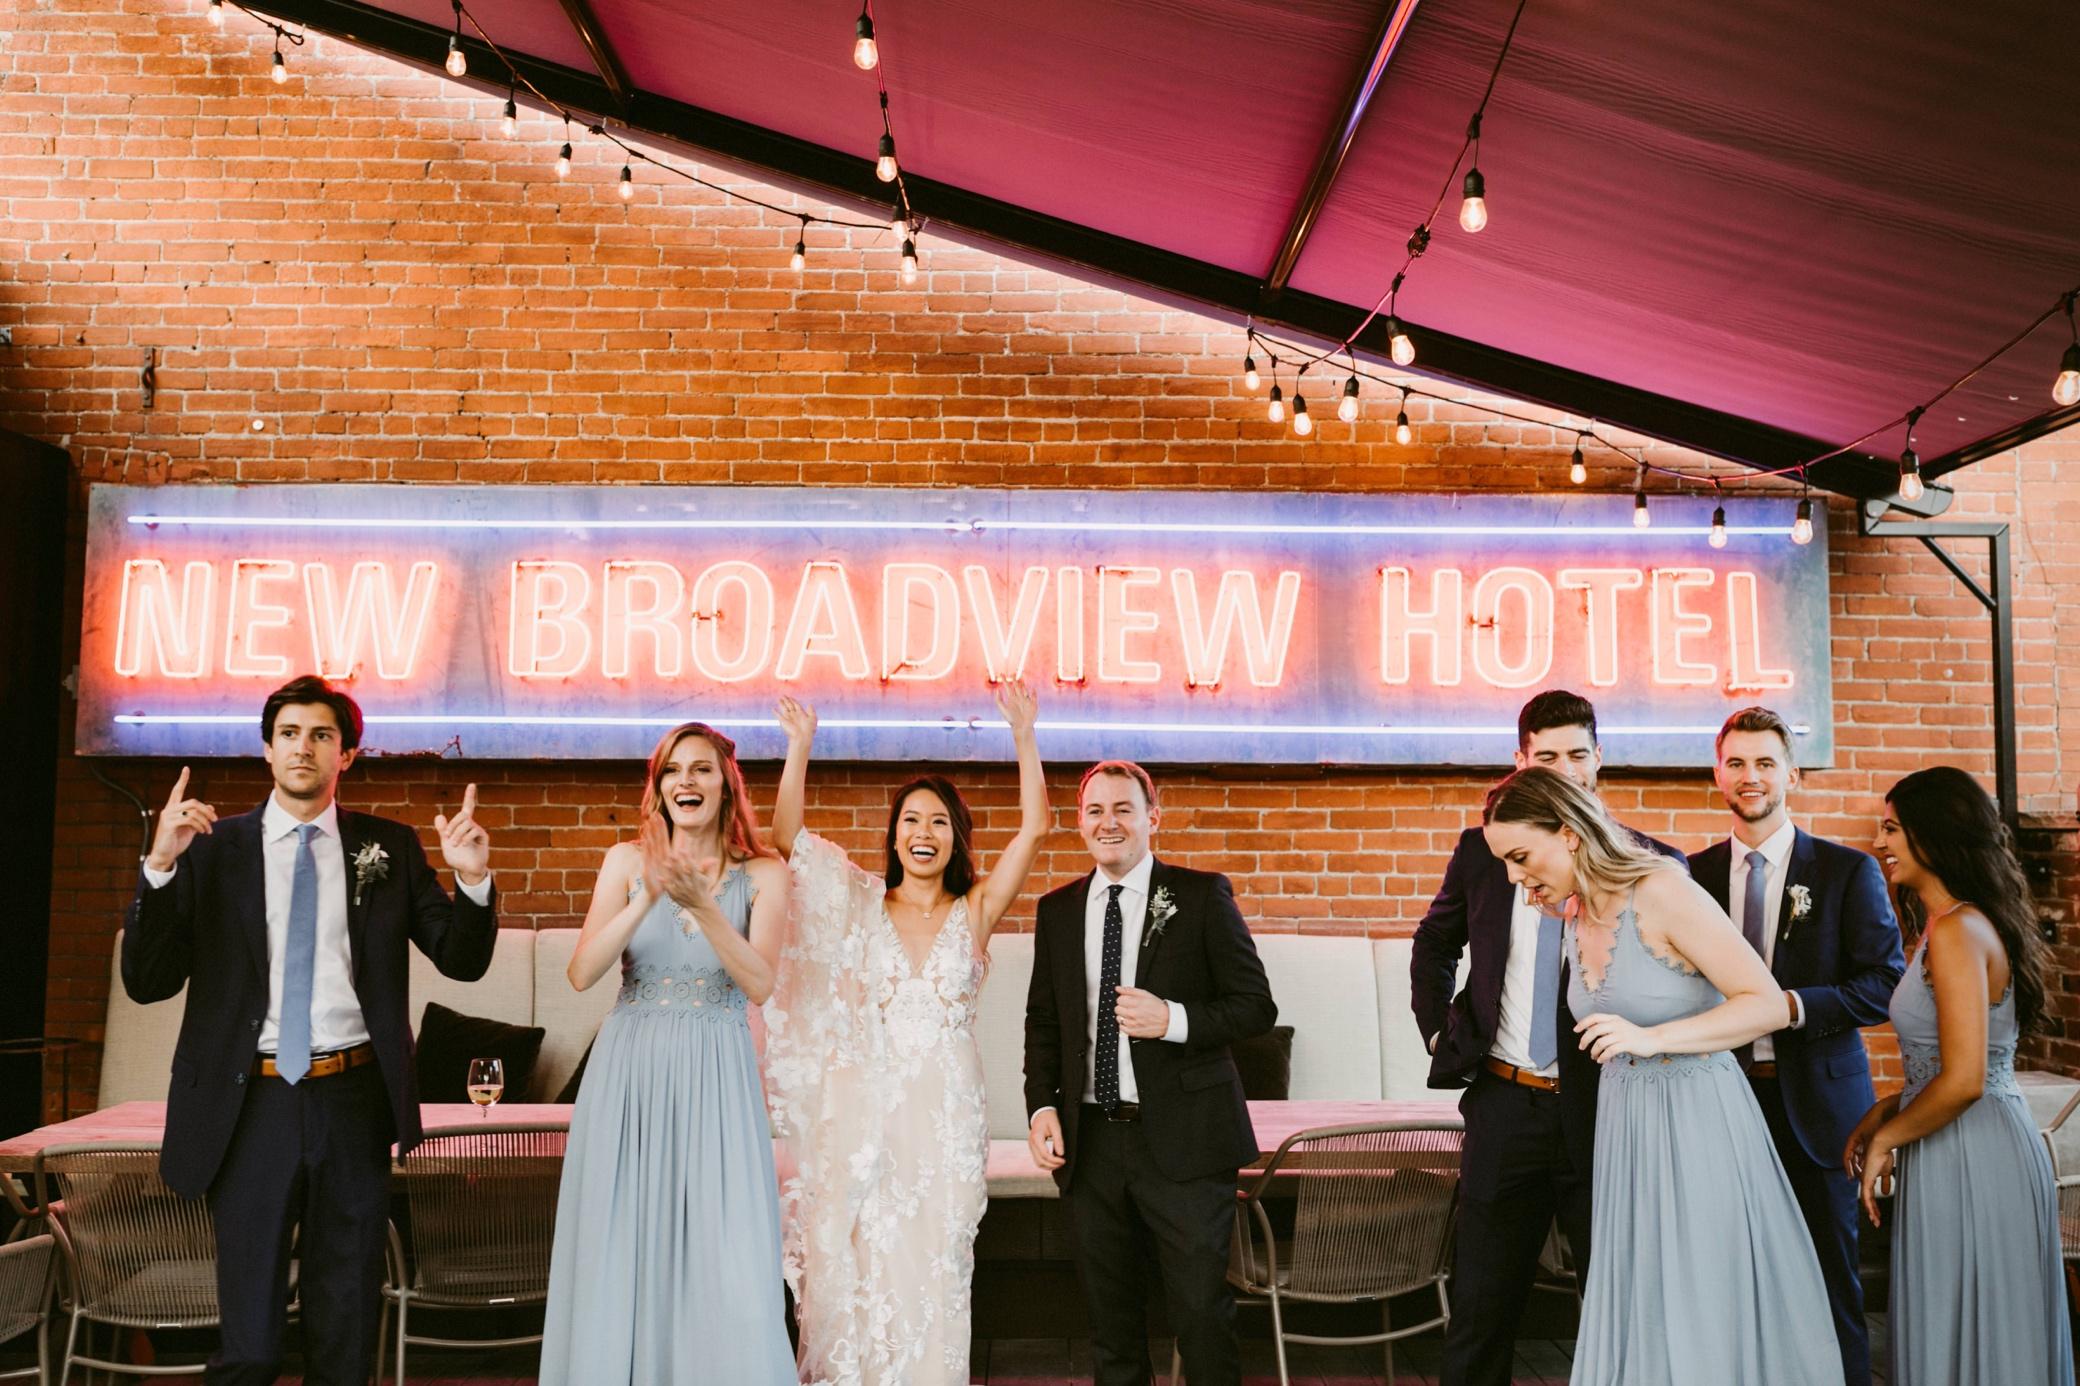 087_The Broadview Hotel Wedding (604 of 913).jpg